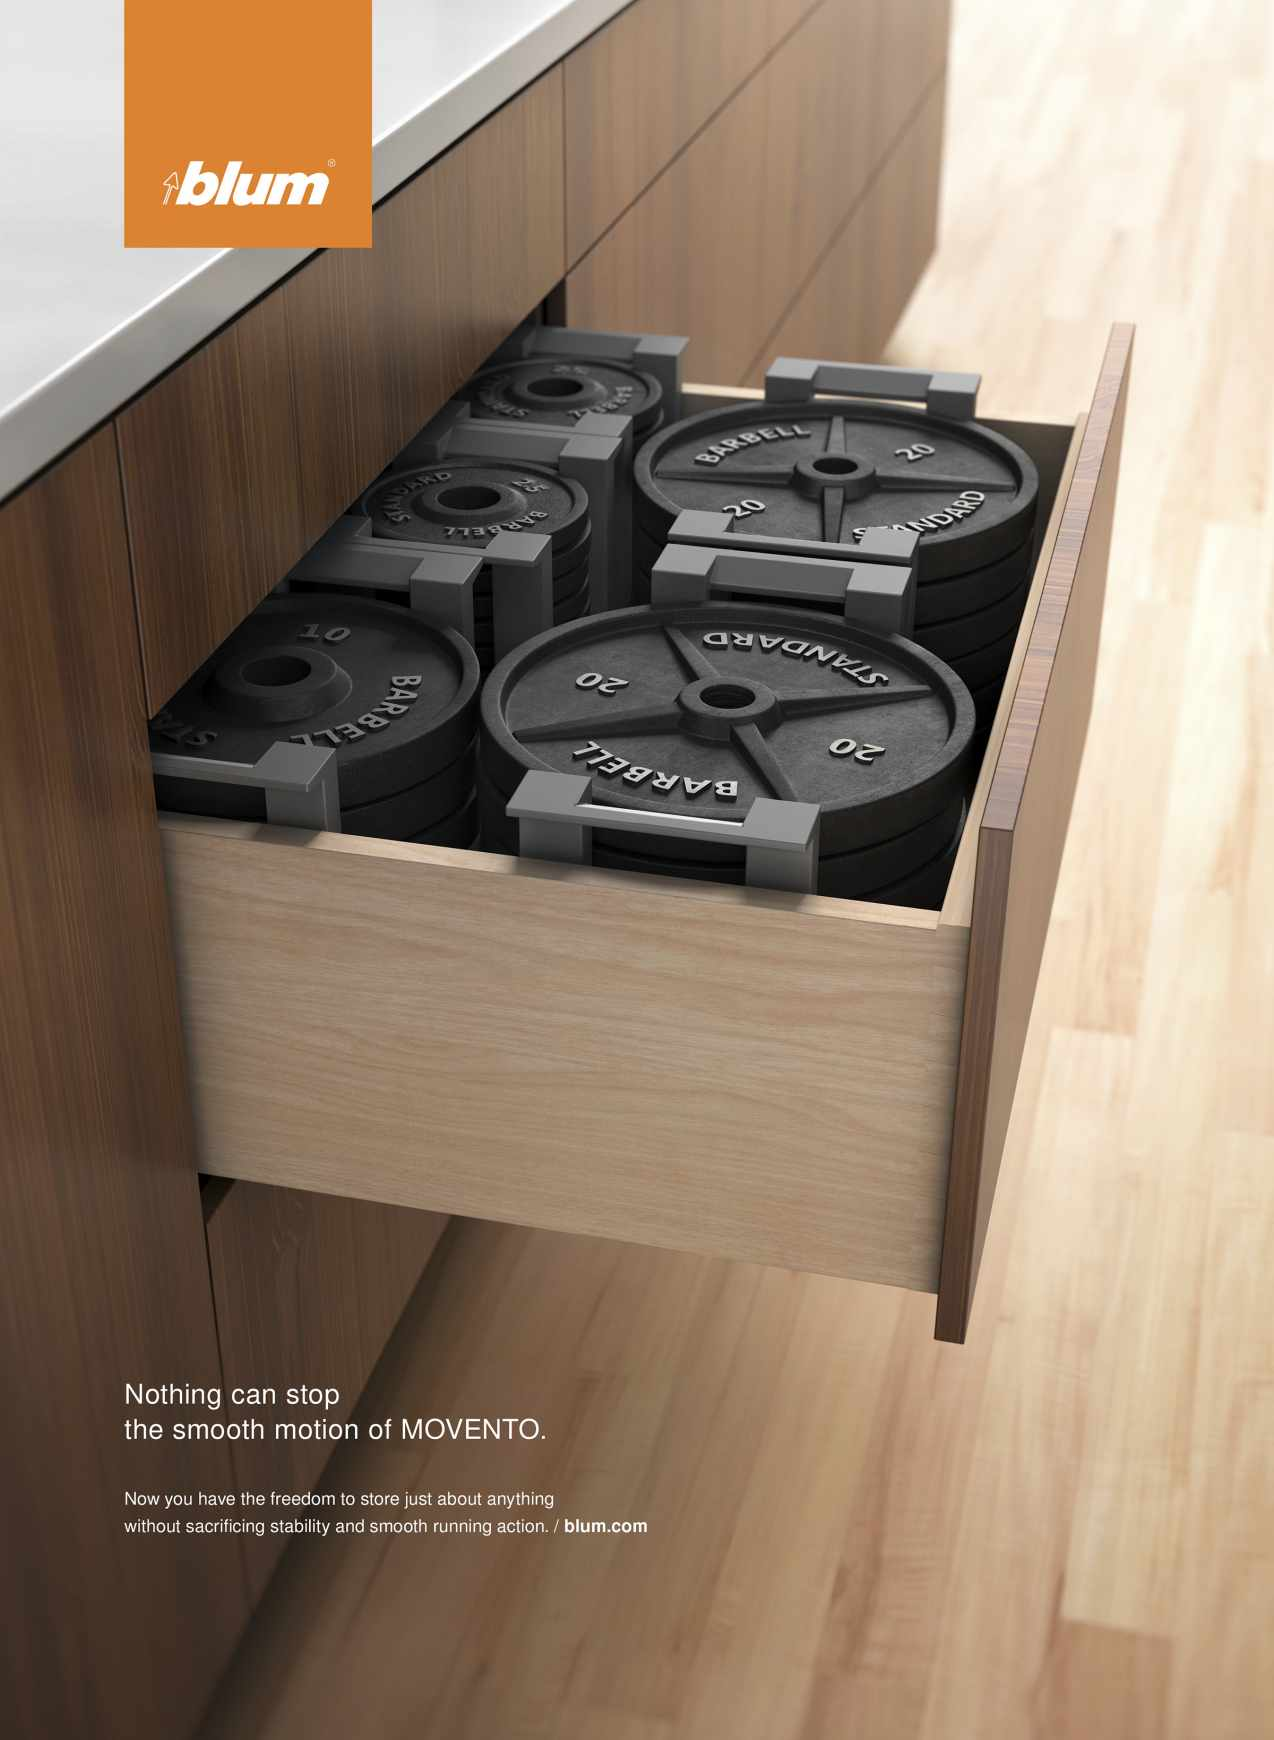 Blum Print Ad - MOVENTO Weights